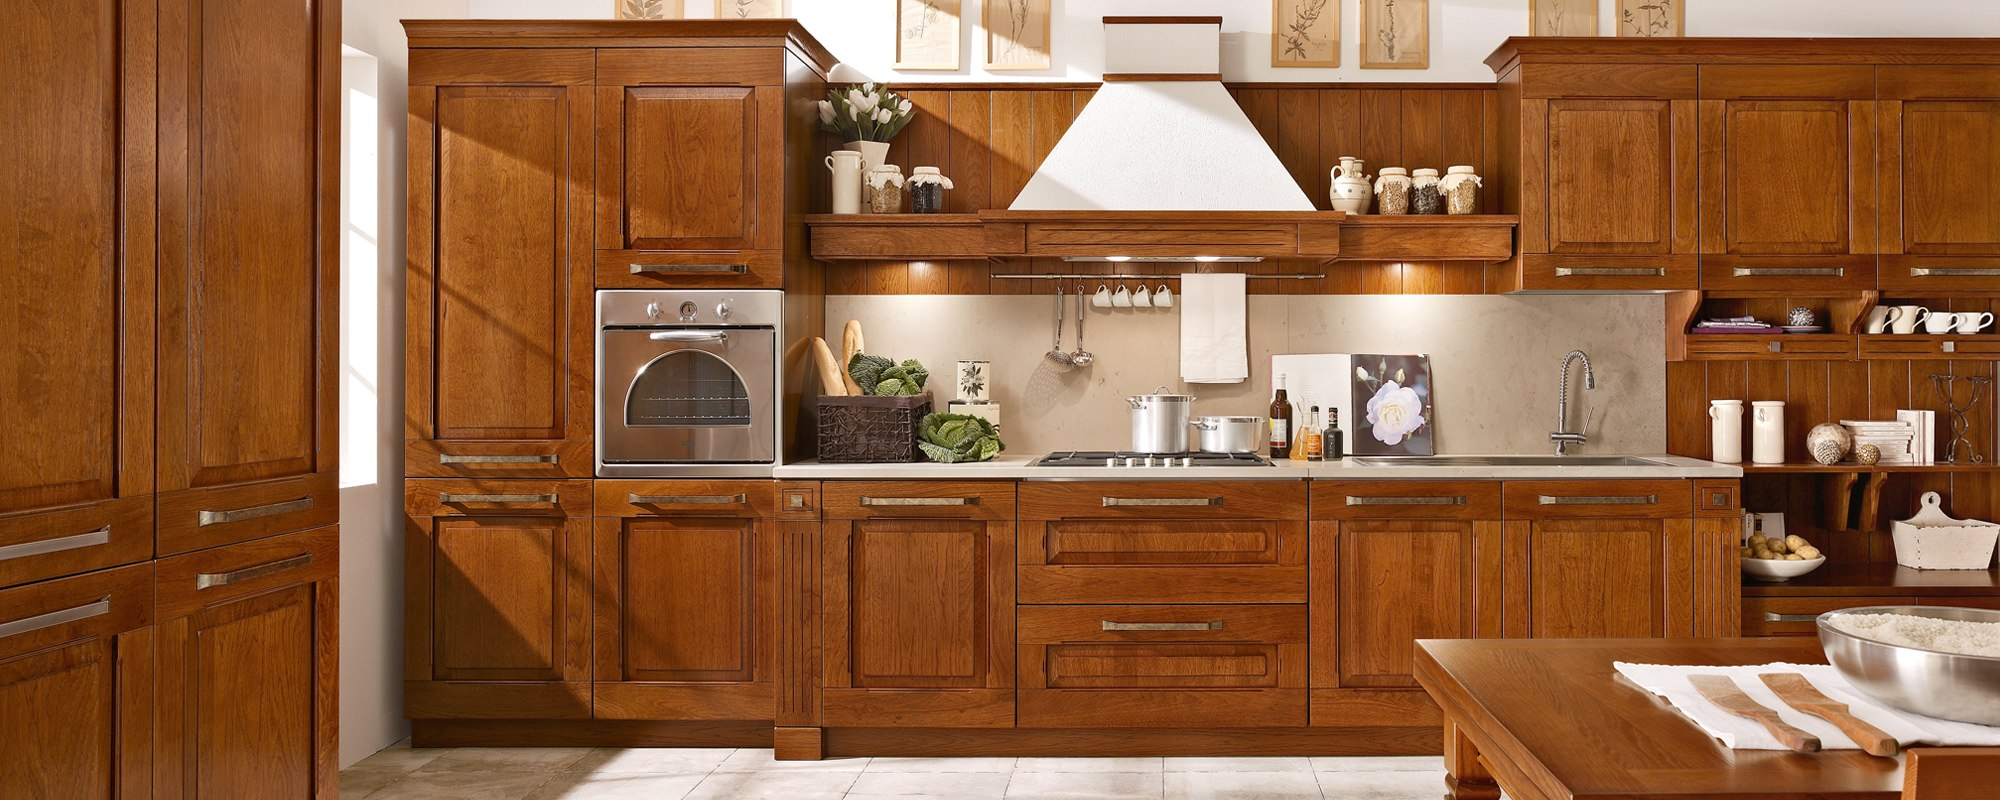 Aida cucine stosa for Cucine catalogo